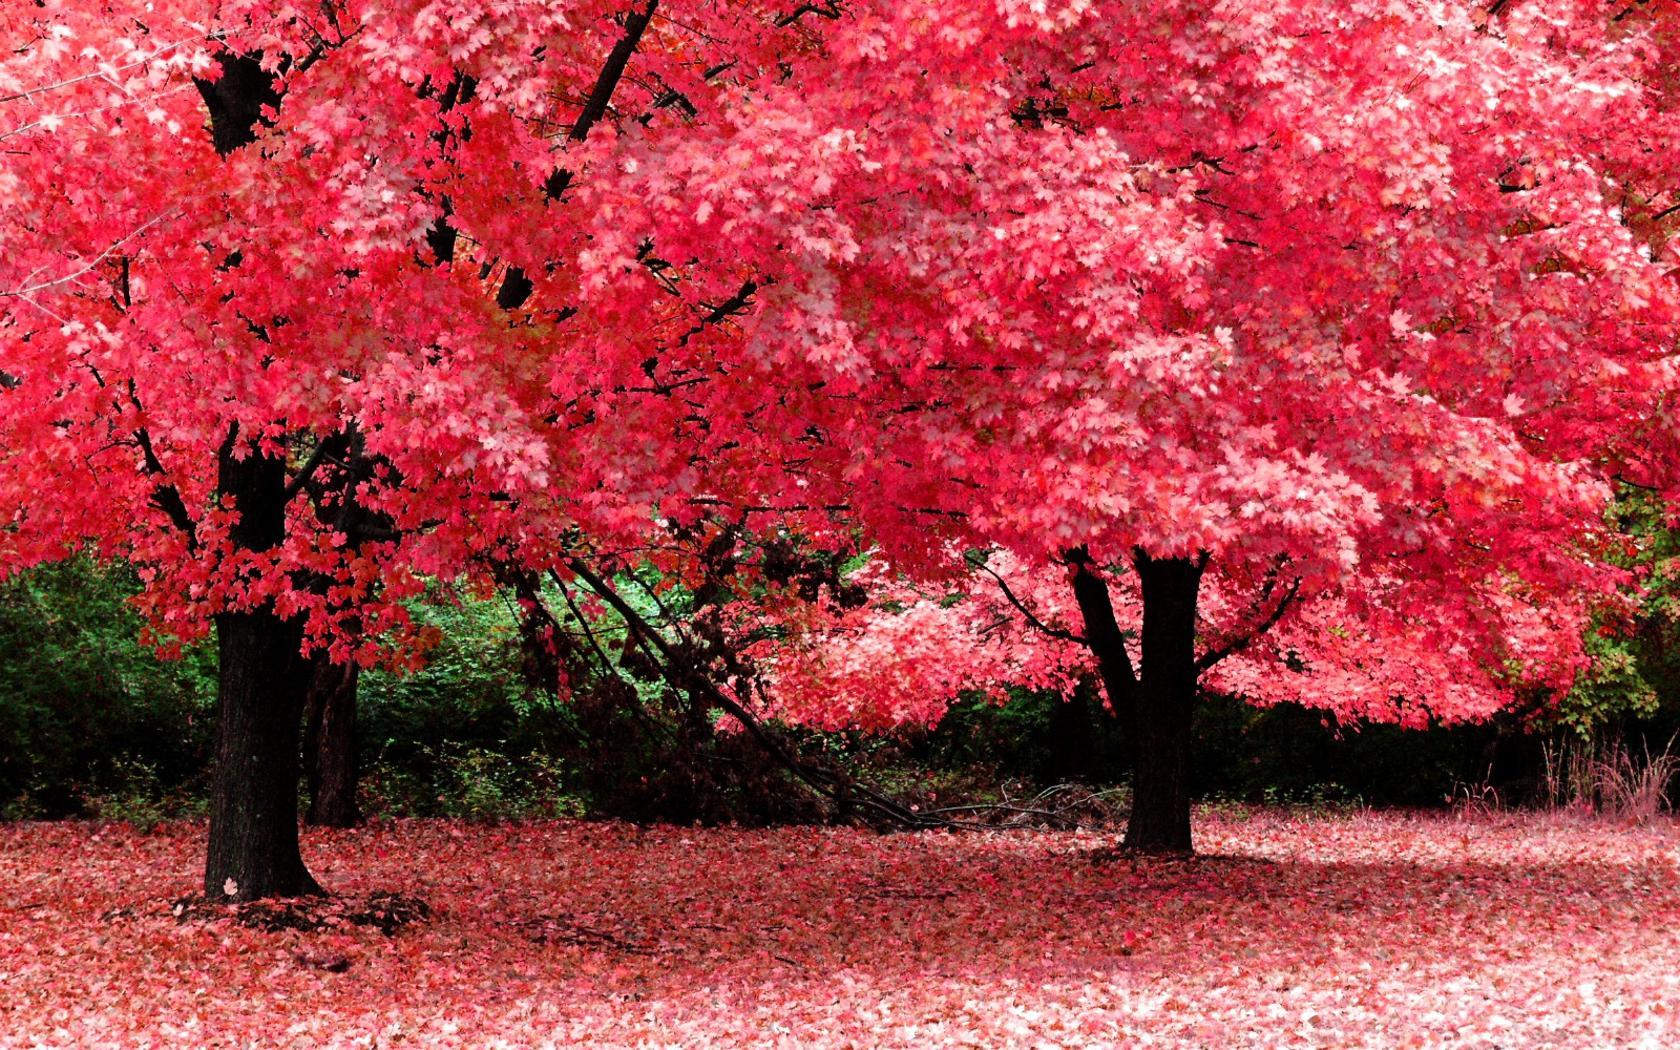 Autumn Garden Widescreen - Autumn Garden Widescreen